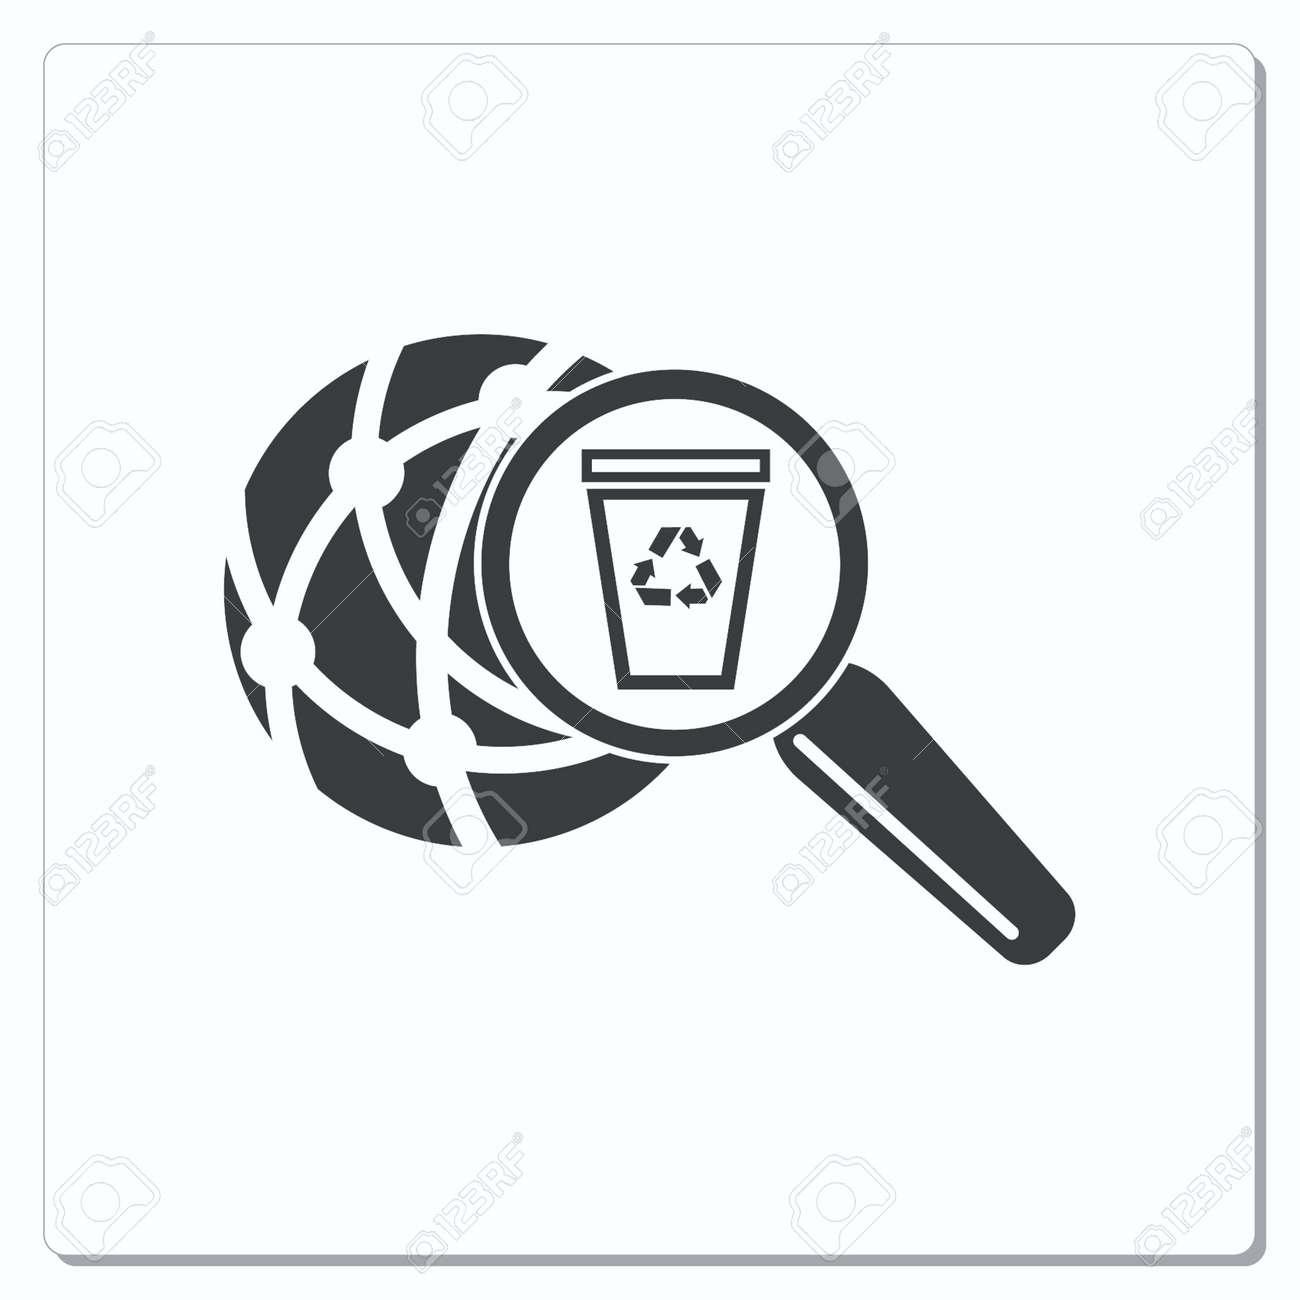 Throw away the trash icon, recycle icon